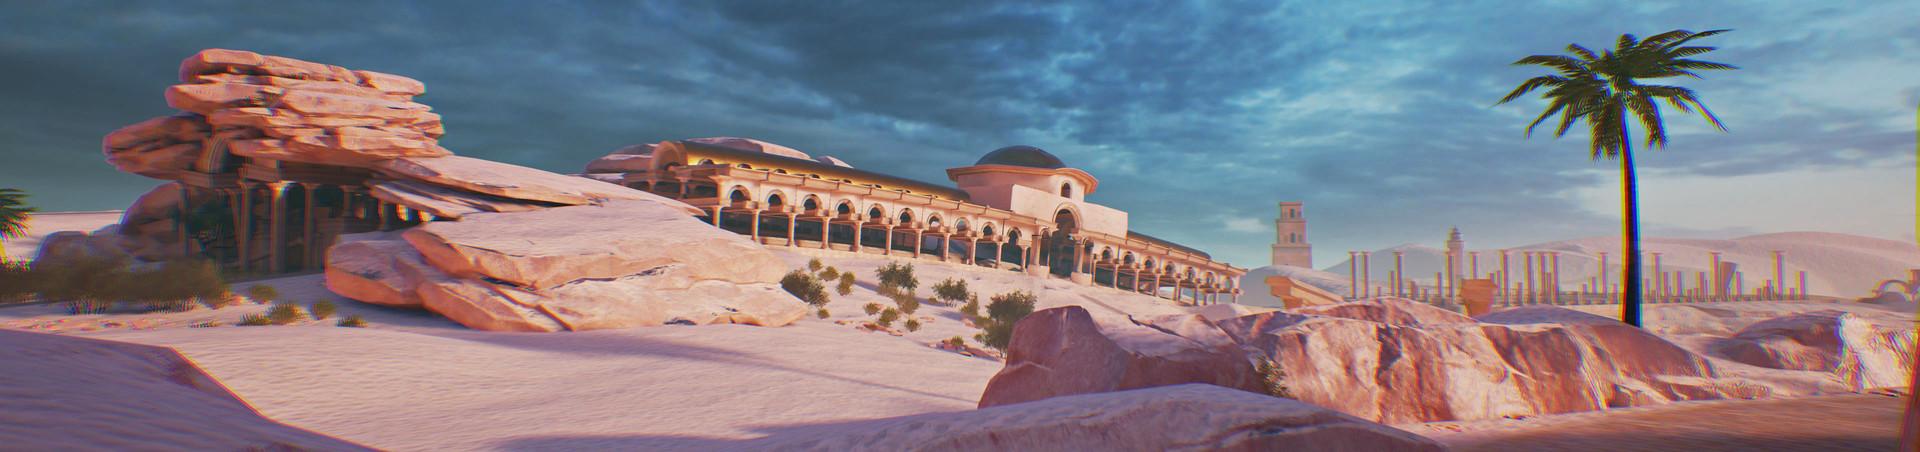 Florian thomasset desert temple 1